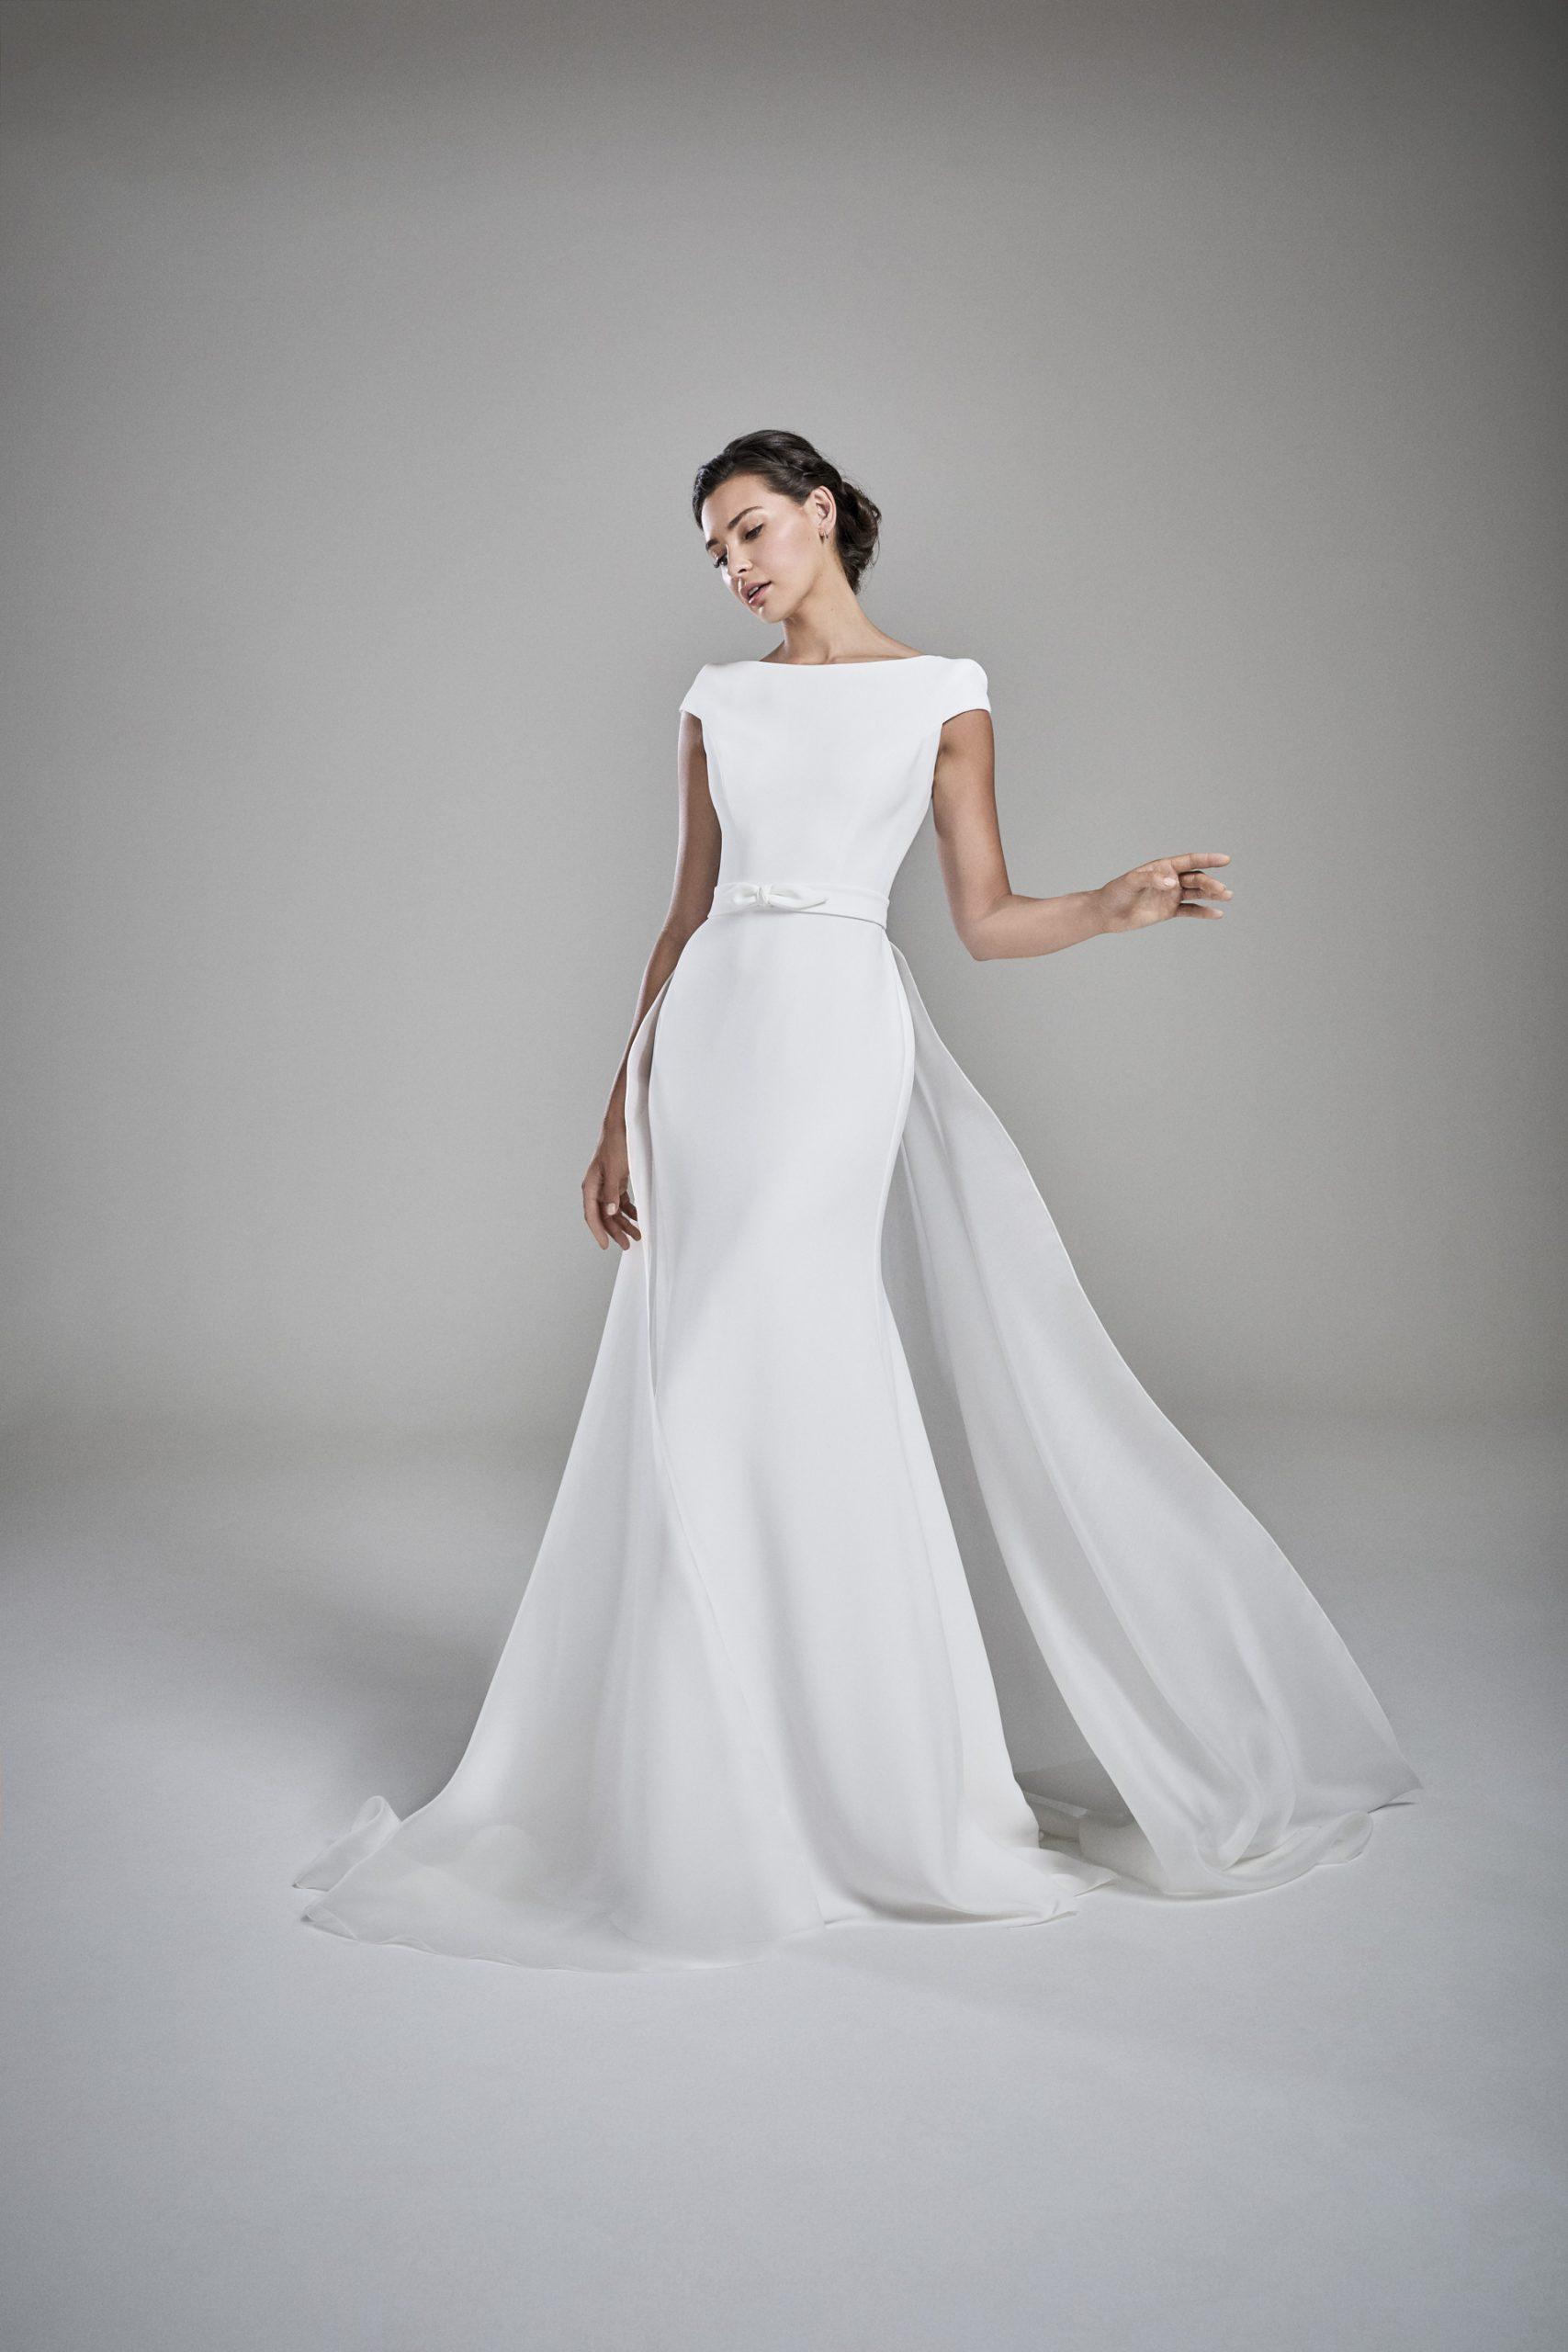 Suzanne Neville Amelia wedding dress